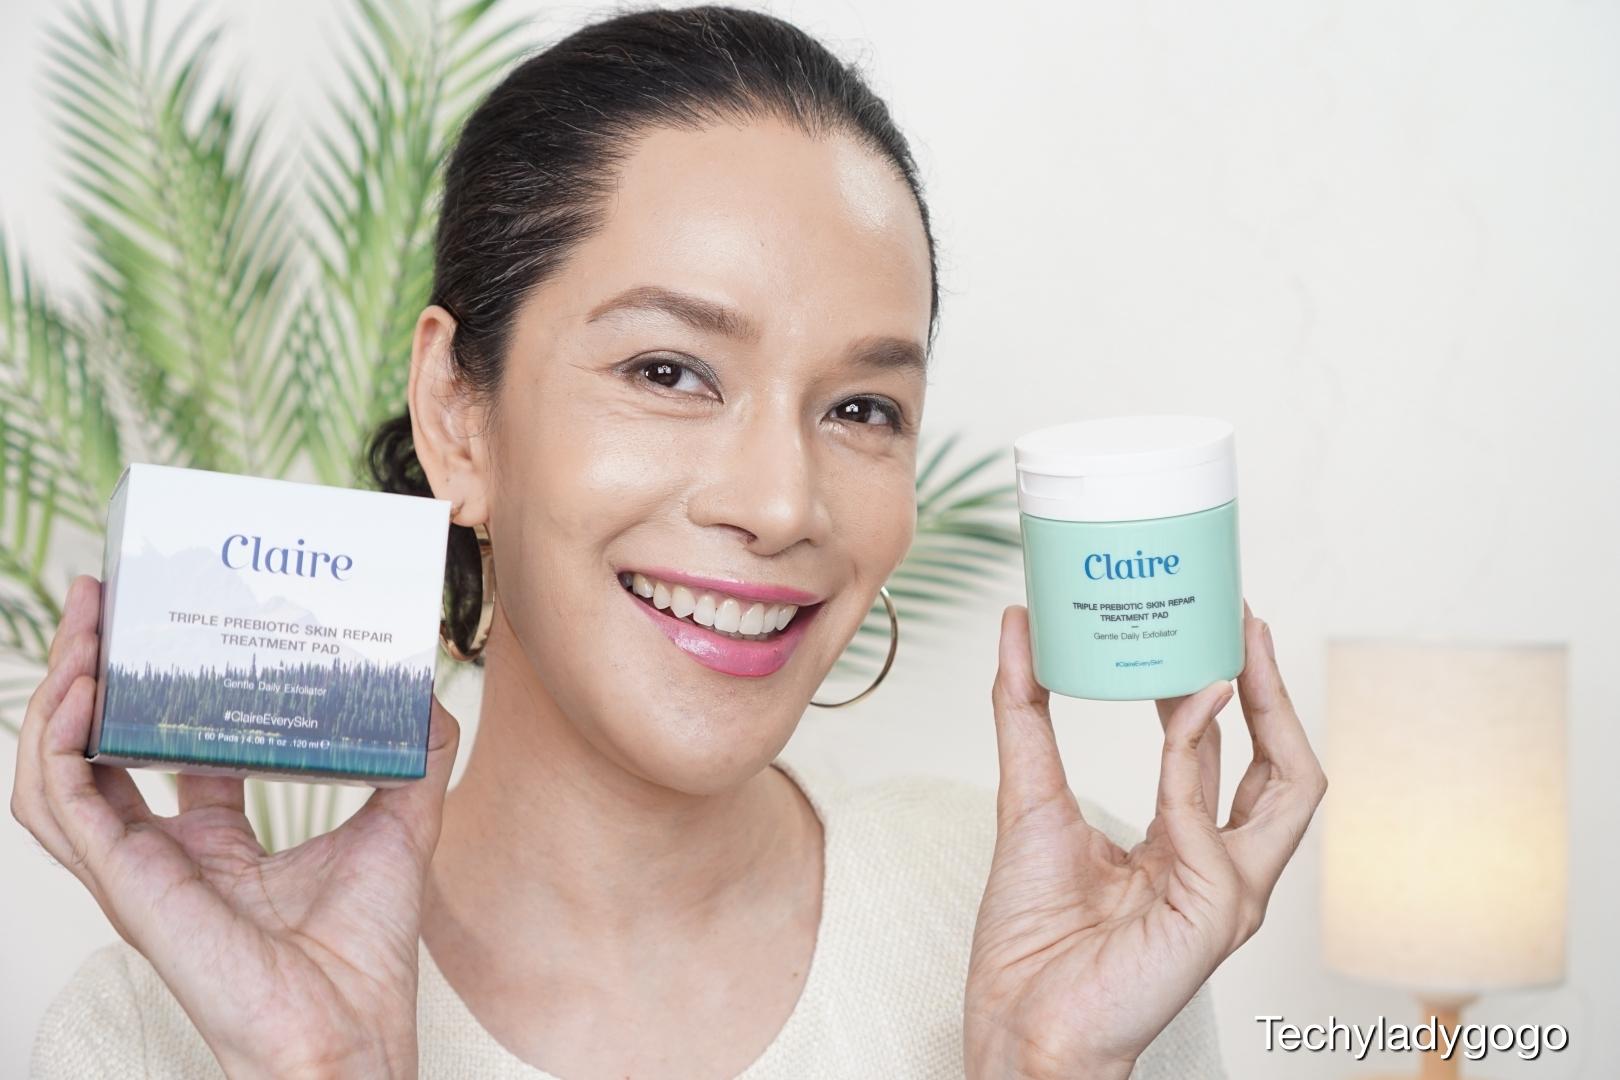 Claire Triple Prebiotic Skin Repair Treatment Pad Techyladygogo